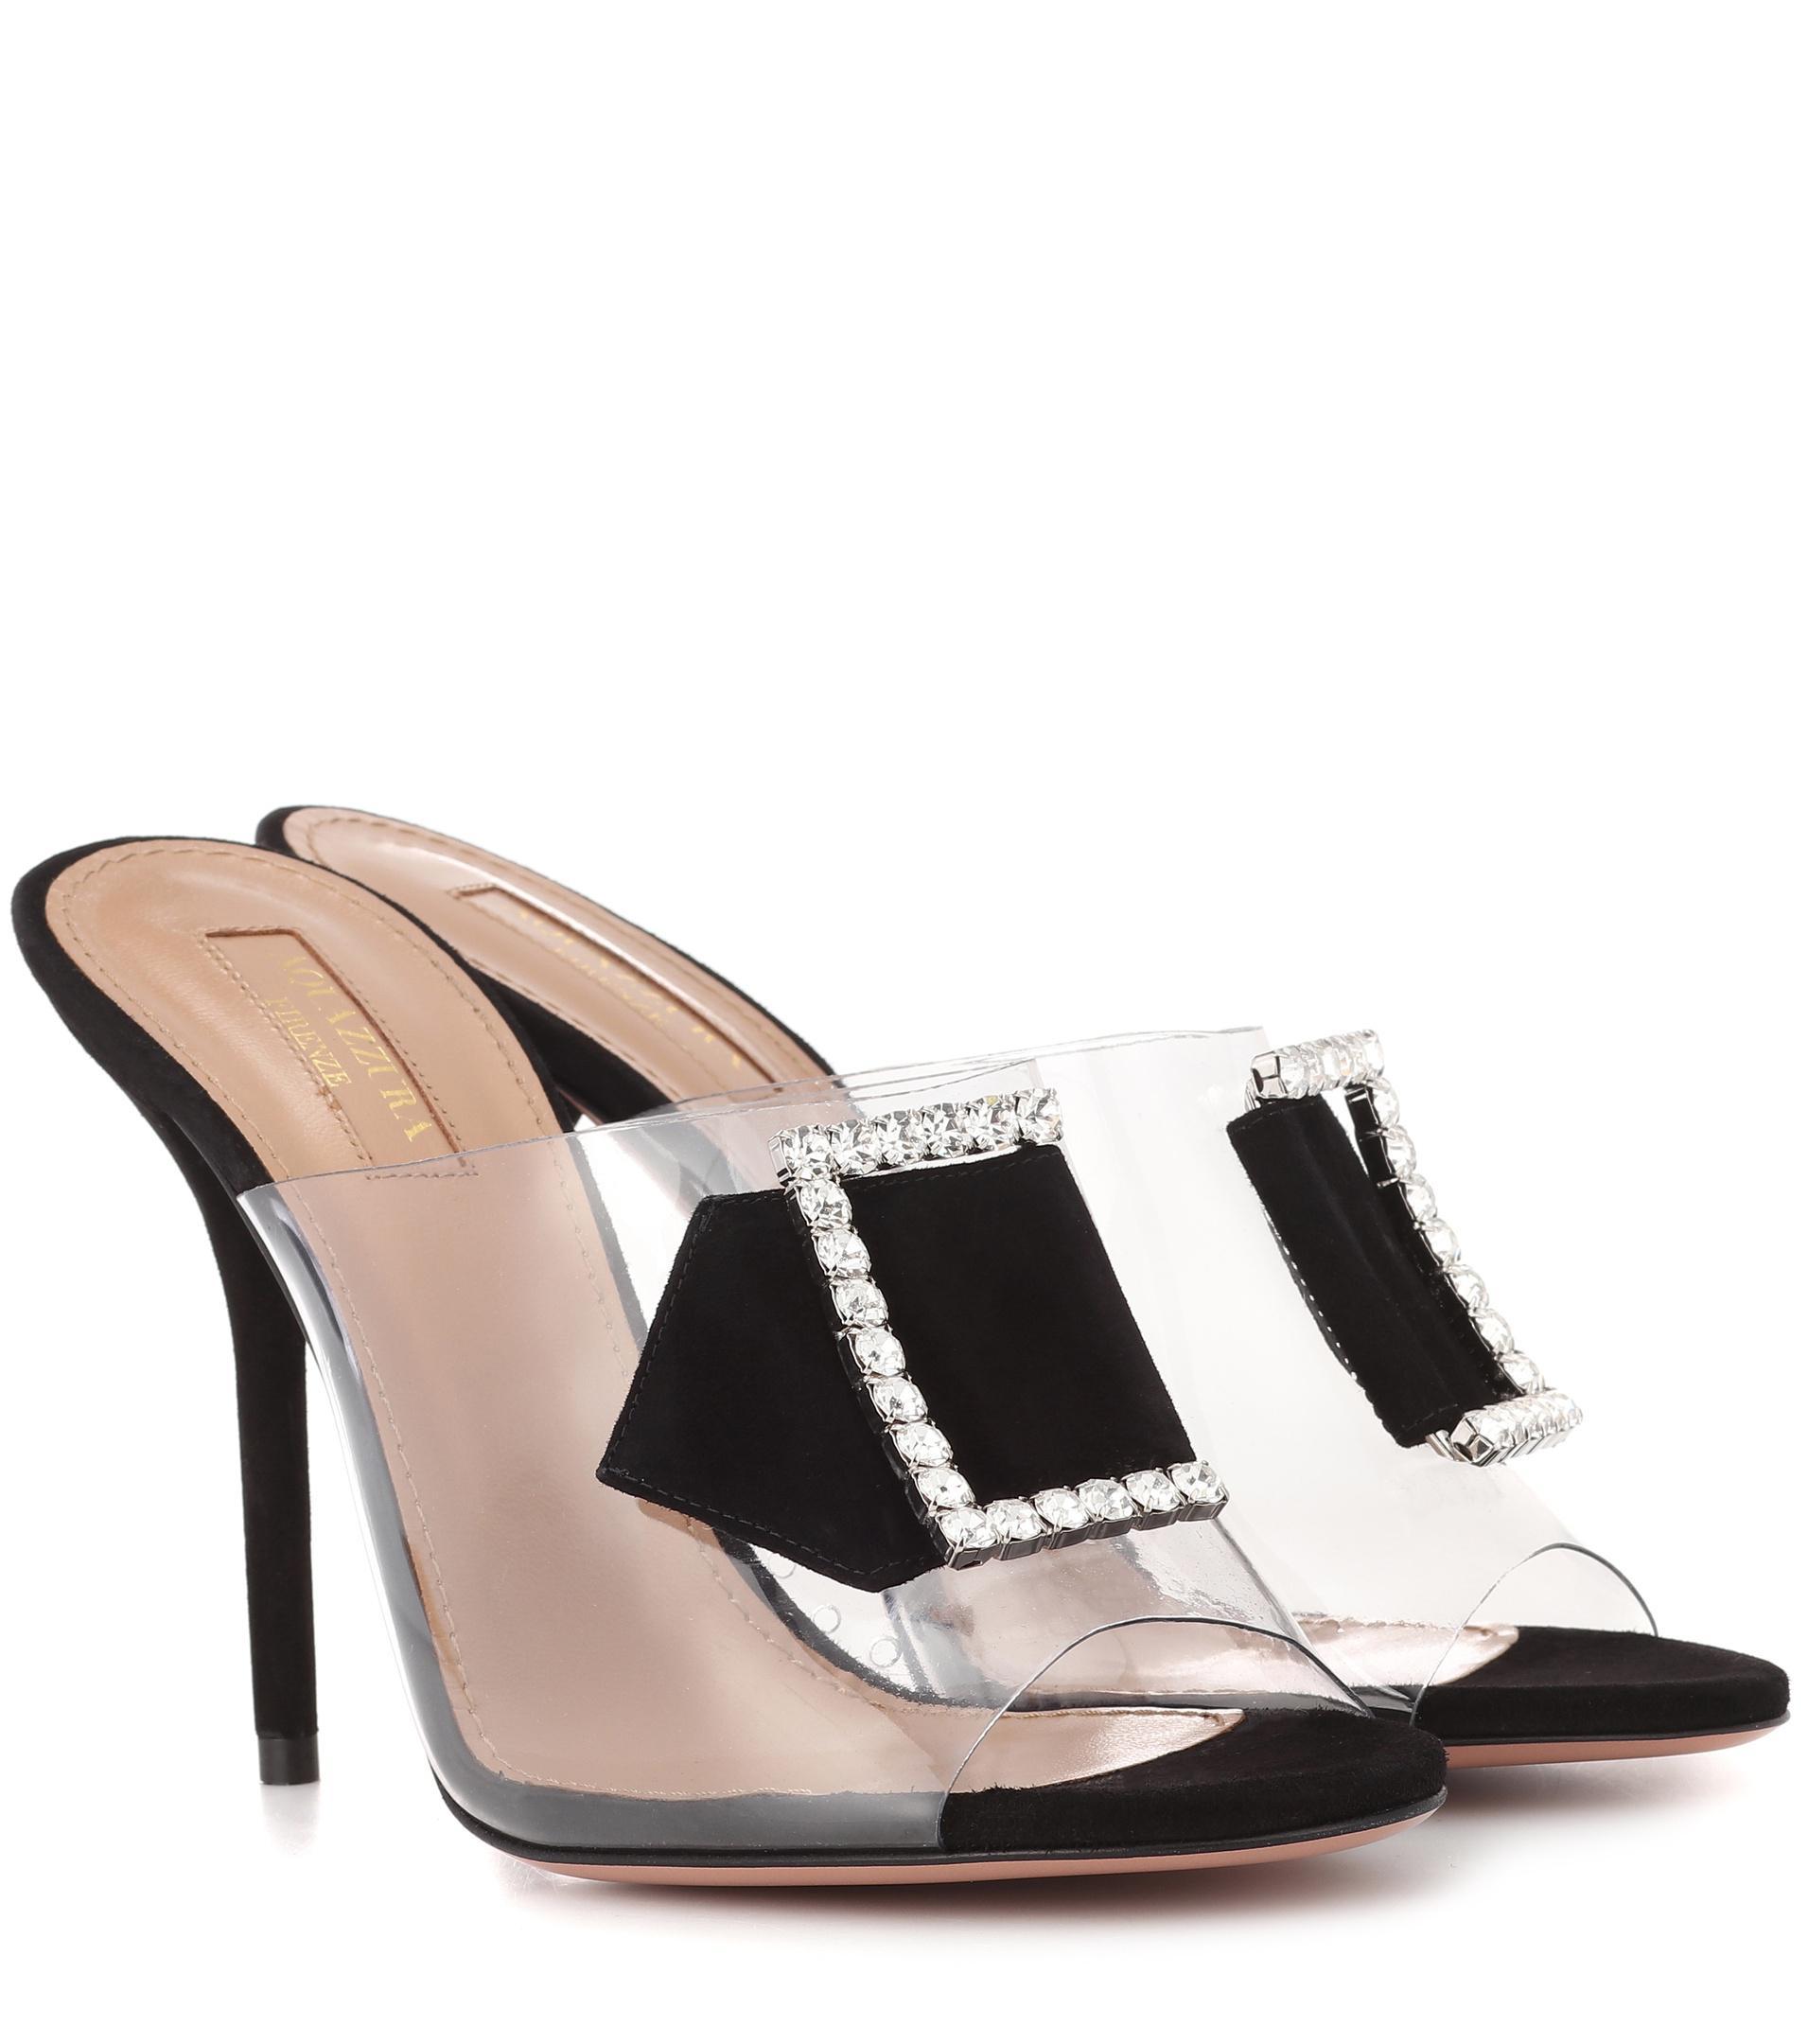 1bbbd44e01dc Lyst - Aquazzura Sparkles 105 Embellished Sandals in Black